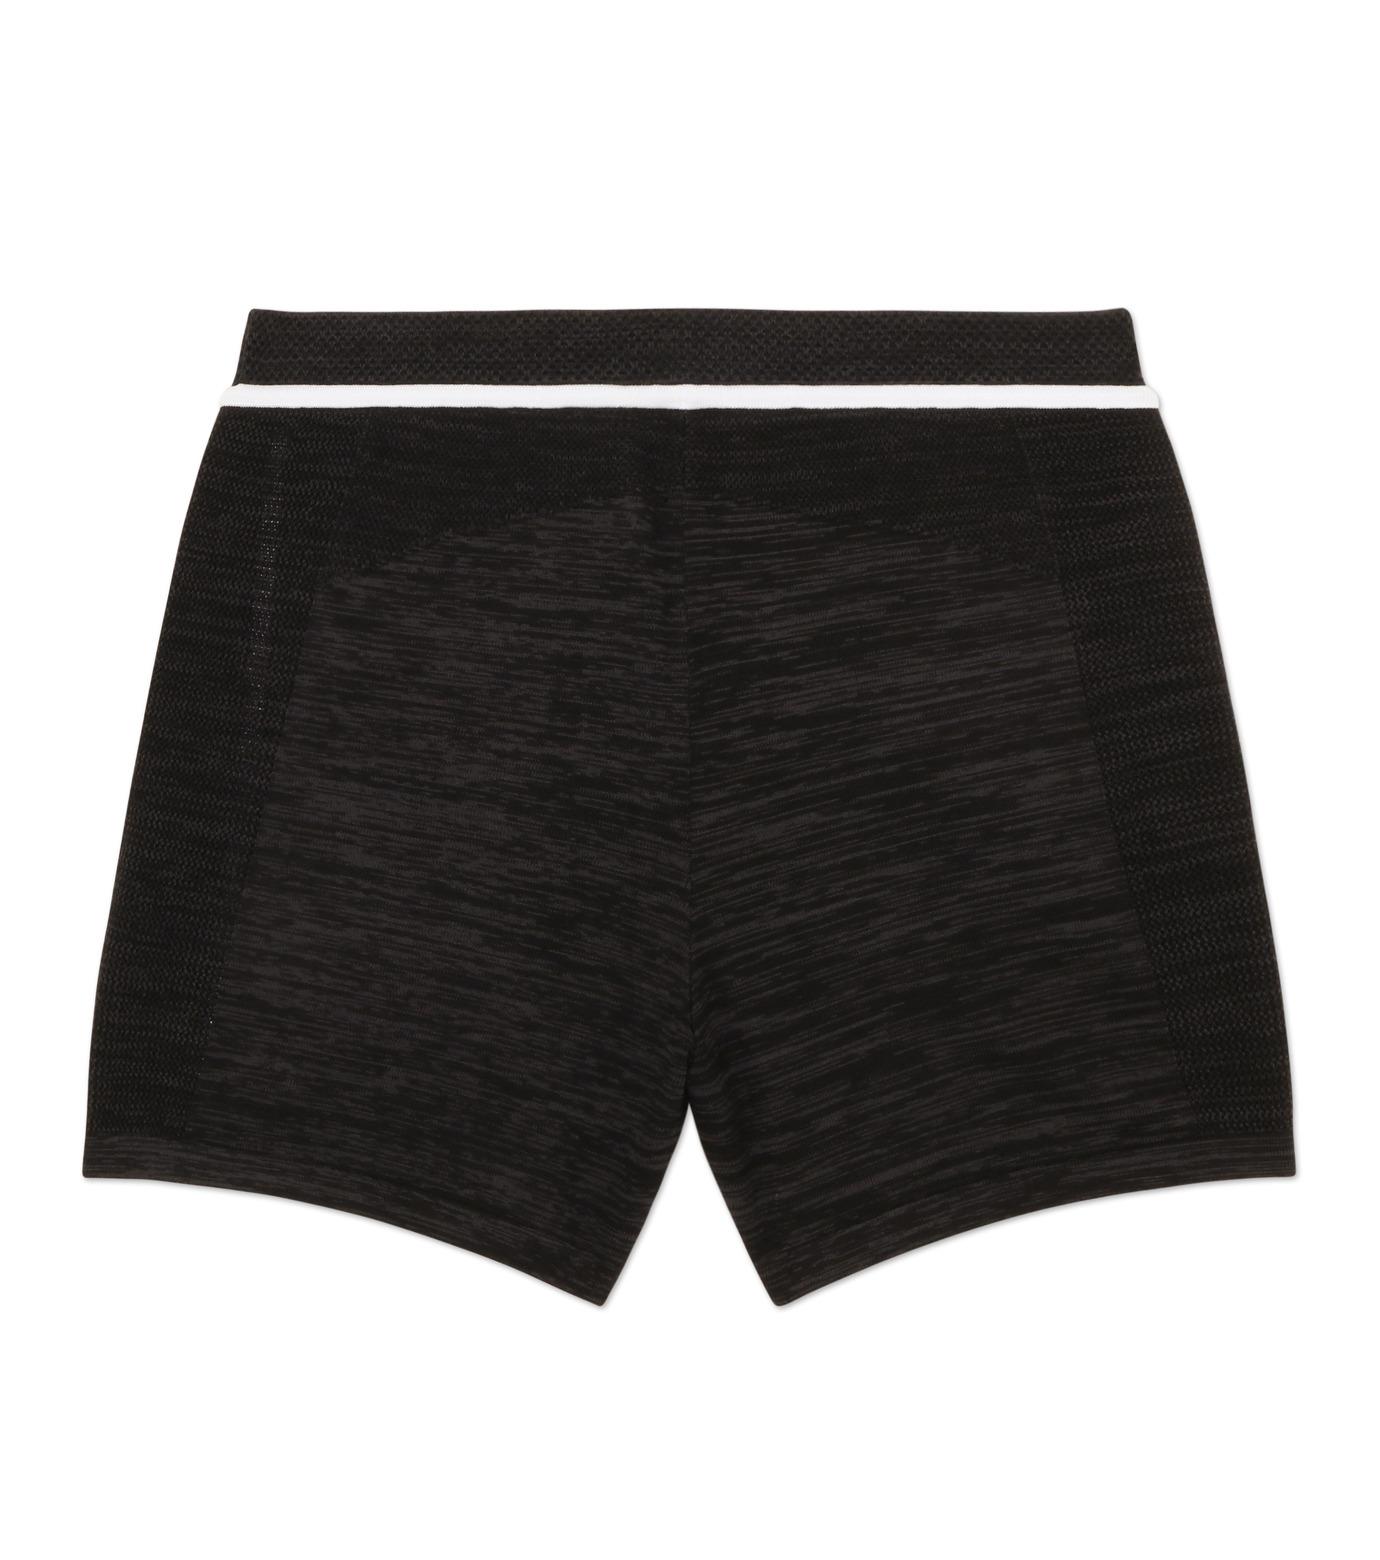 NIKE(ナイキ)のTECH KNIT SHORT-BLACK(パンツ/pants)-747981-010-13 拡大詳細画像2